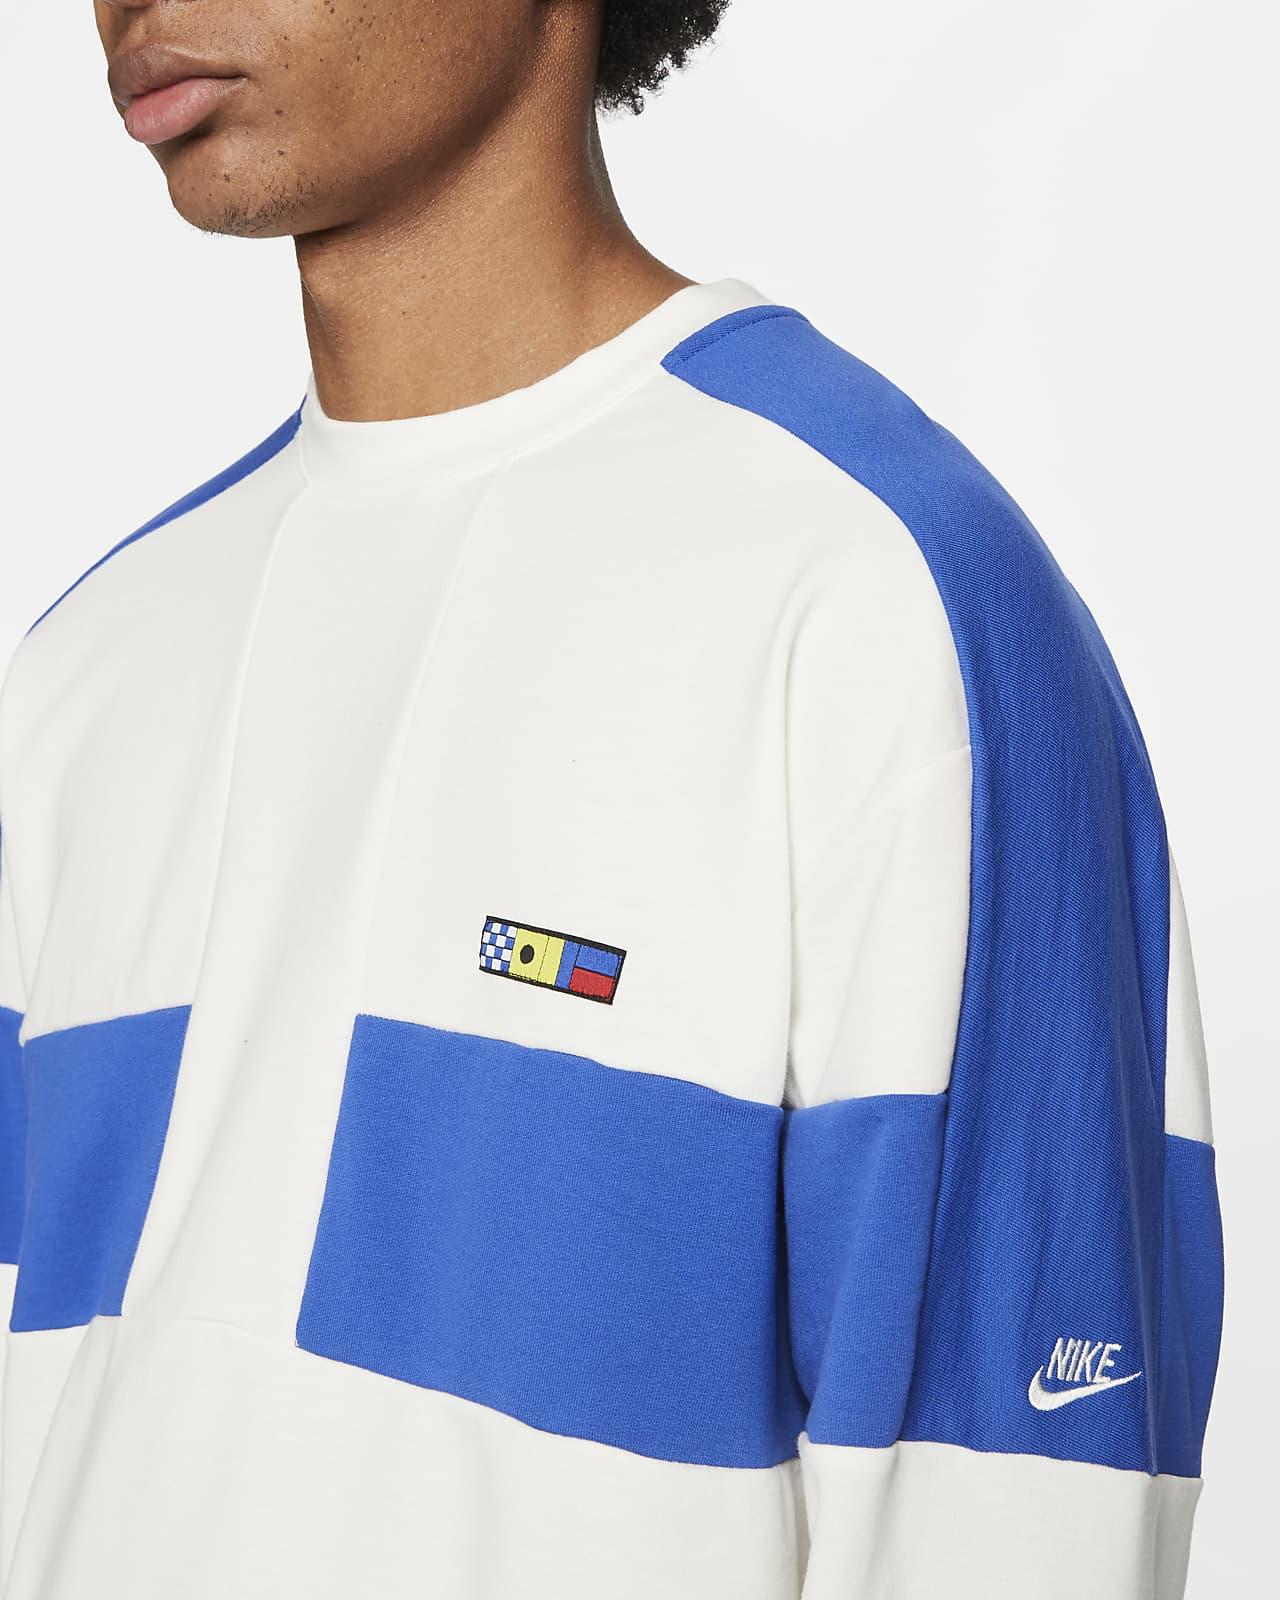 Predownload: Nike Sportswear Reissue Men S French Terry Crew Nike Sa [ 1600 x 1280 Pixel ]